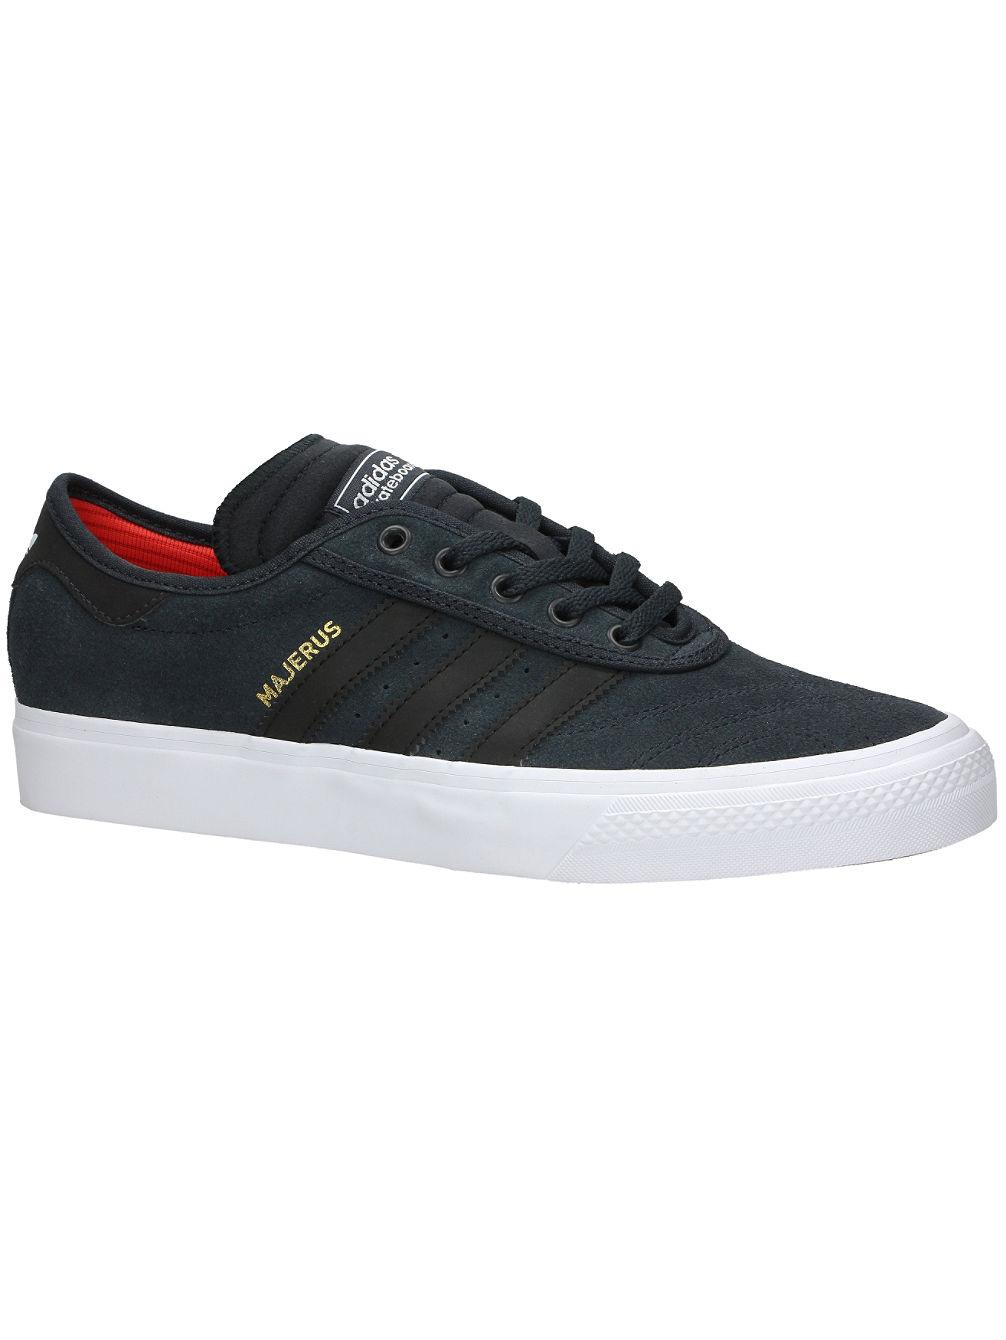 adidas-skateboarding-adi-ease-premiere-adv-skate-shoes